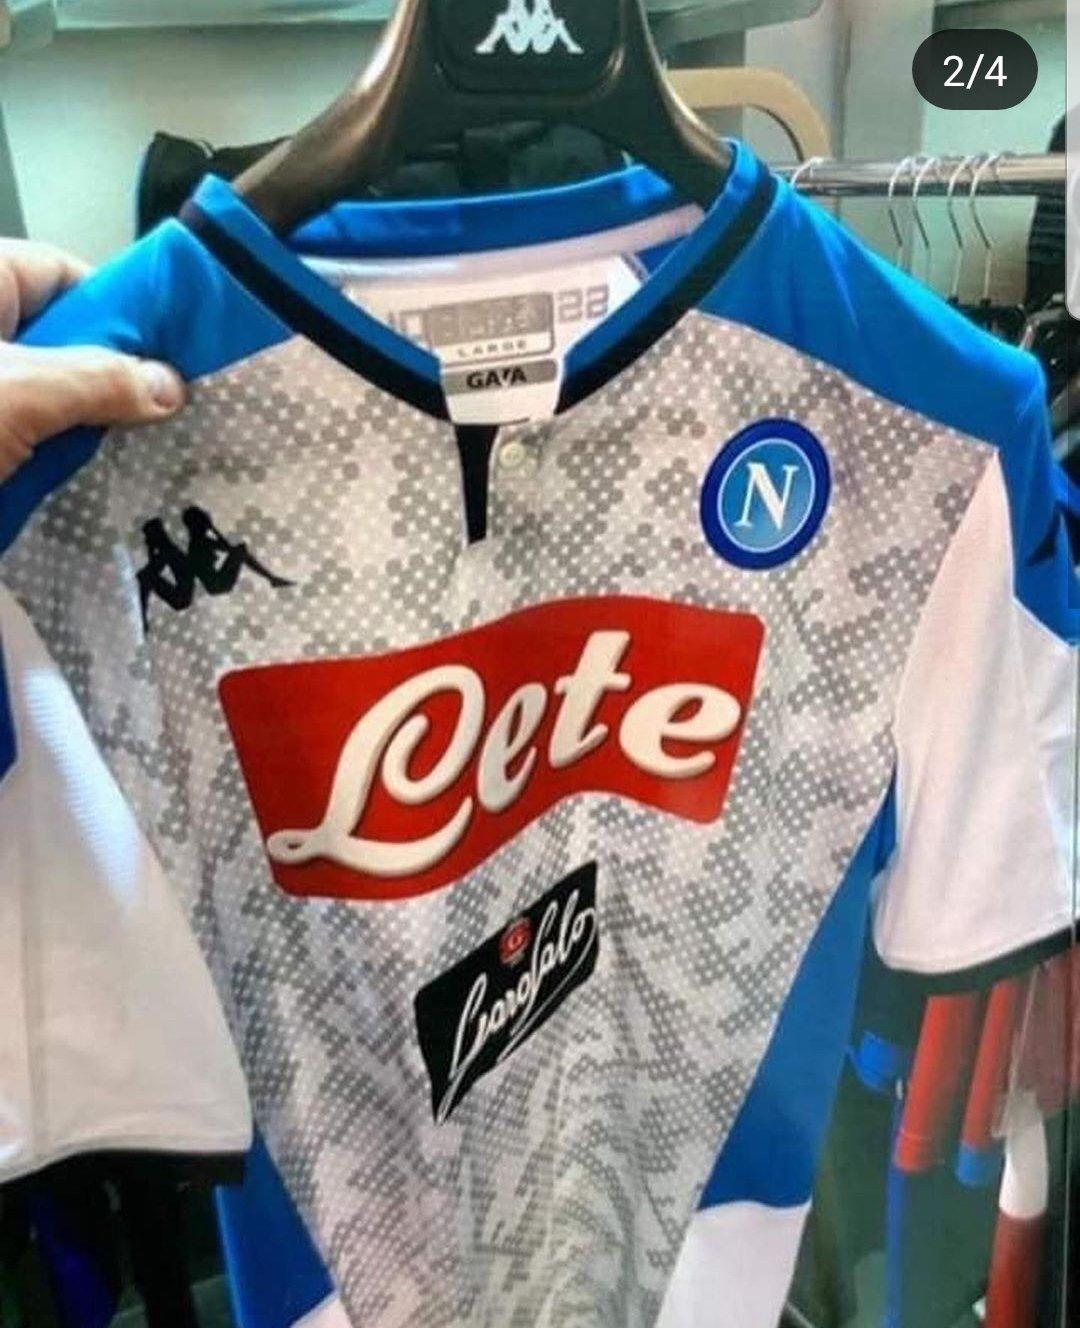 Naples 2020 nouveau maillot third football